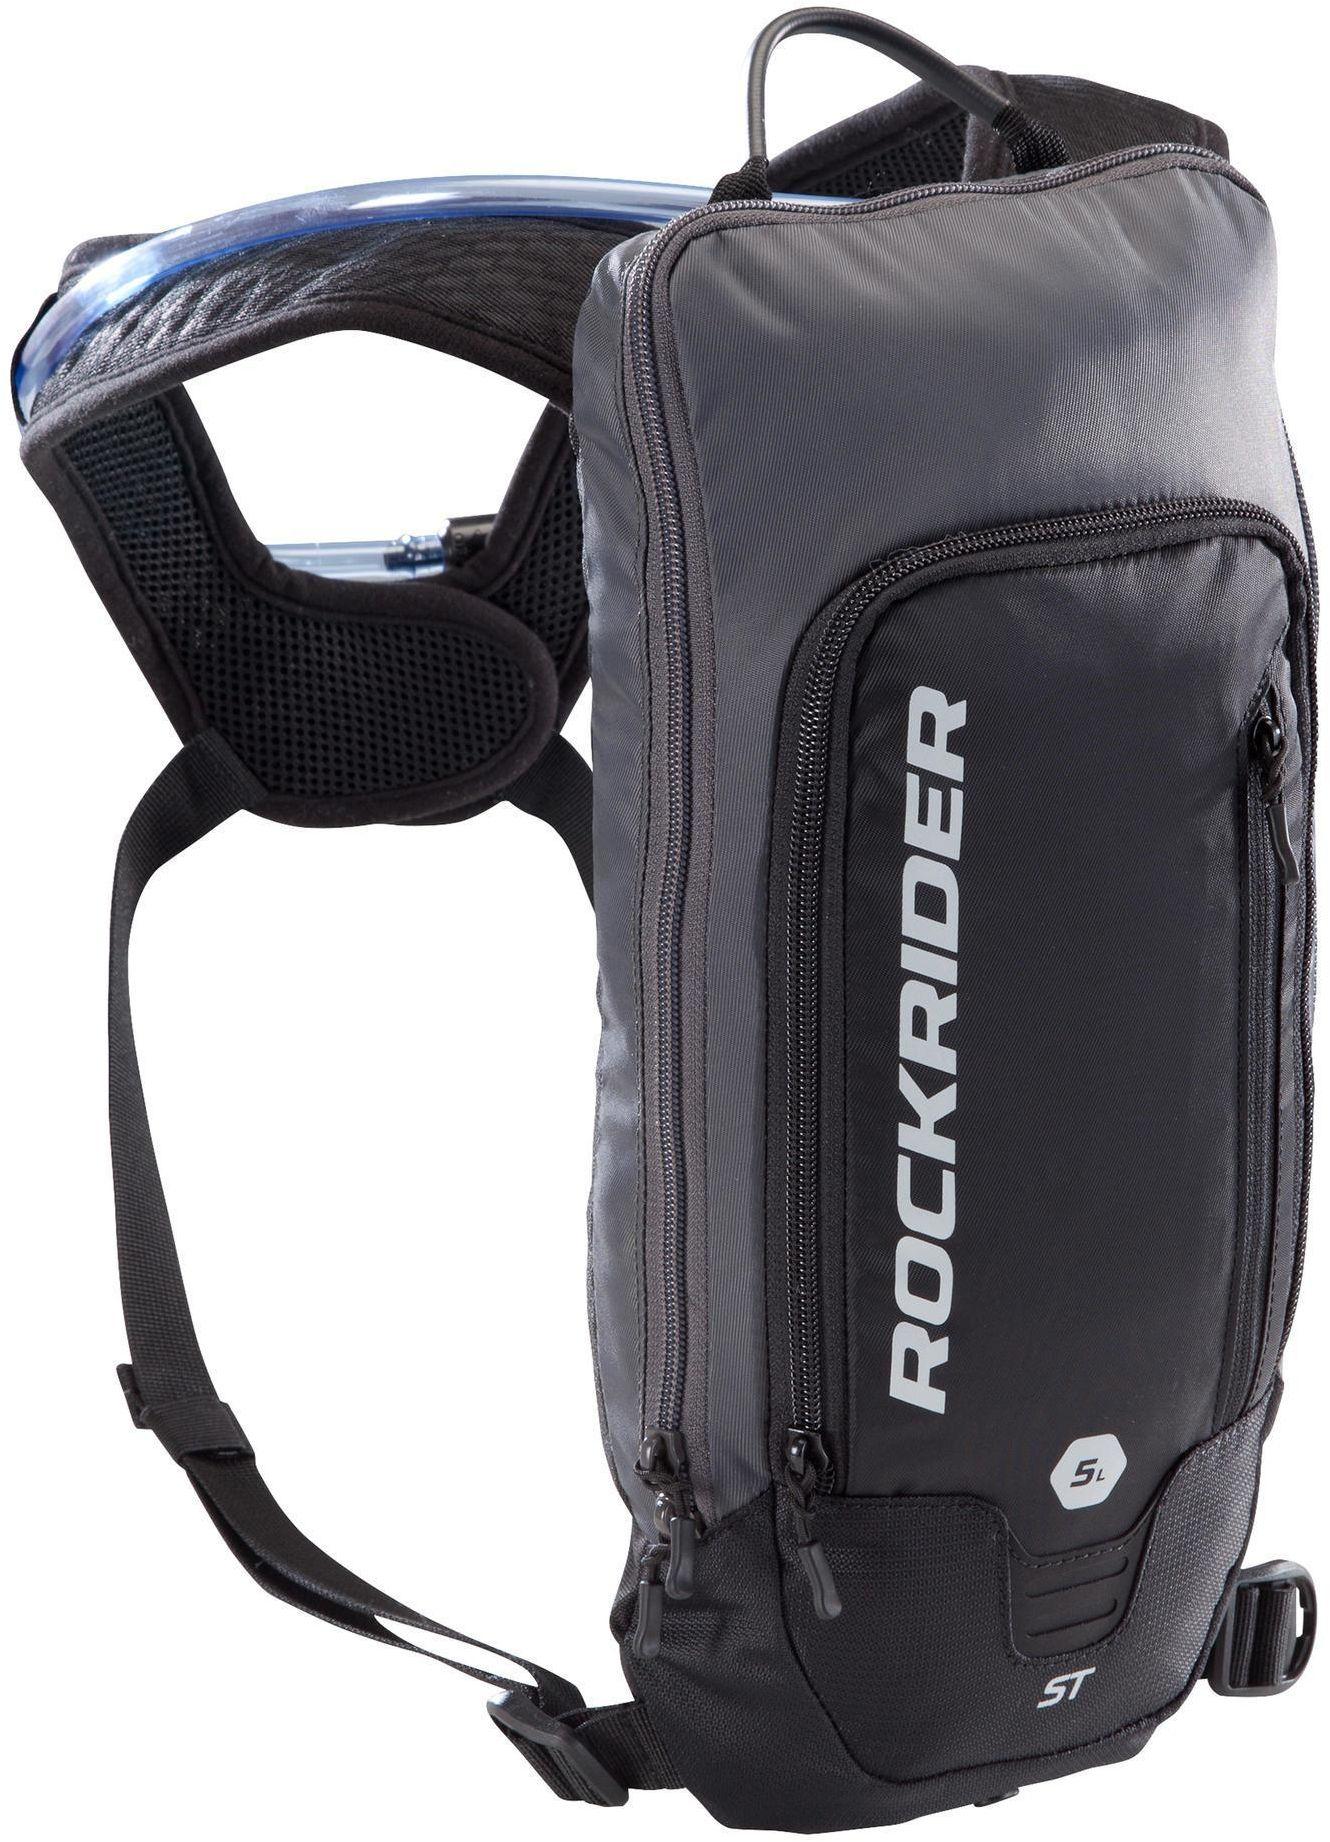 Plecak Z Bukłakiem Na Rower Mtb St 500 4 L - 1 L Wody